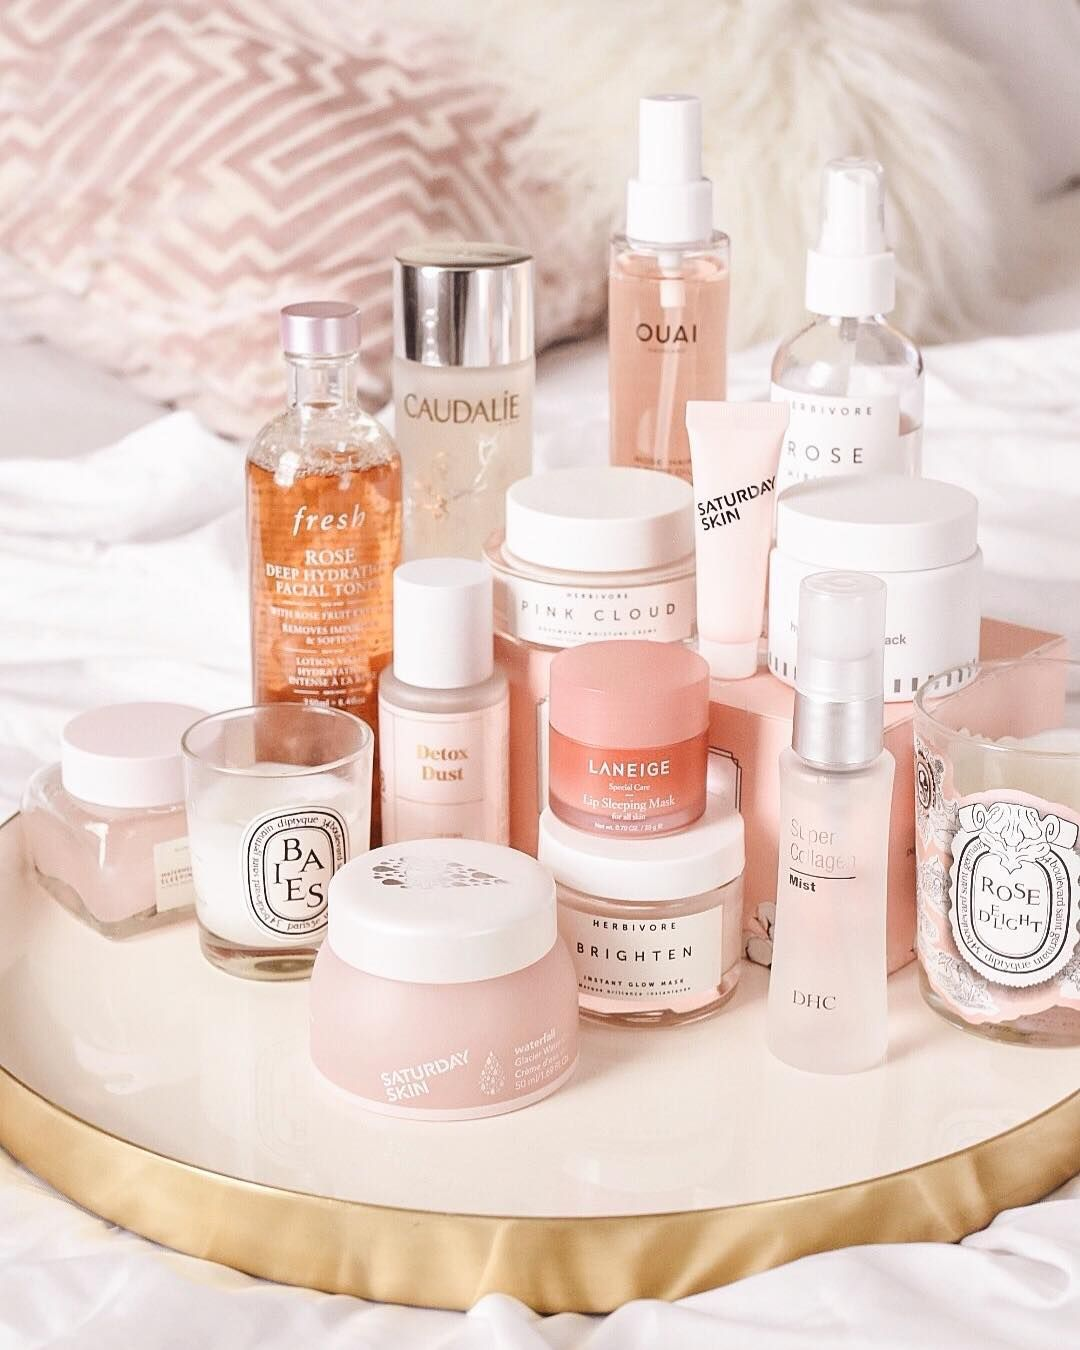 Sokoskincare Skin Care Essentials Skincare Store Beauty Skin Care